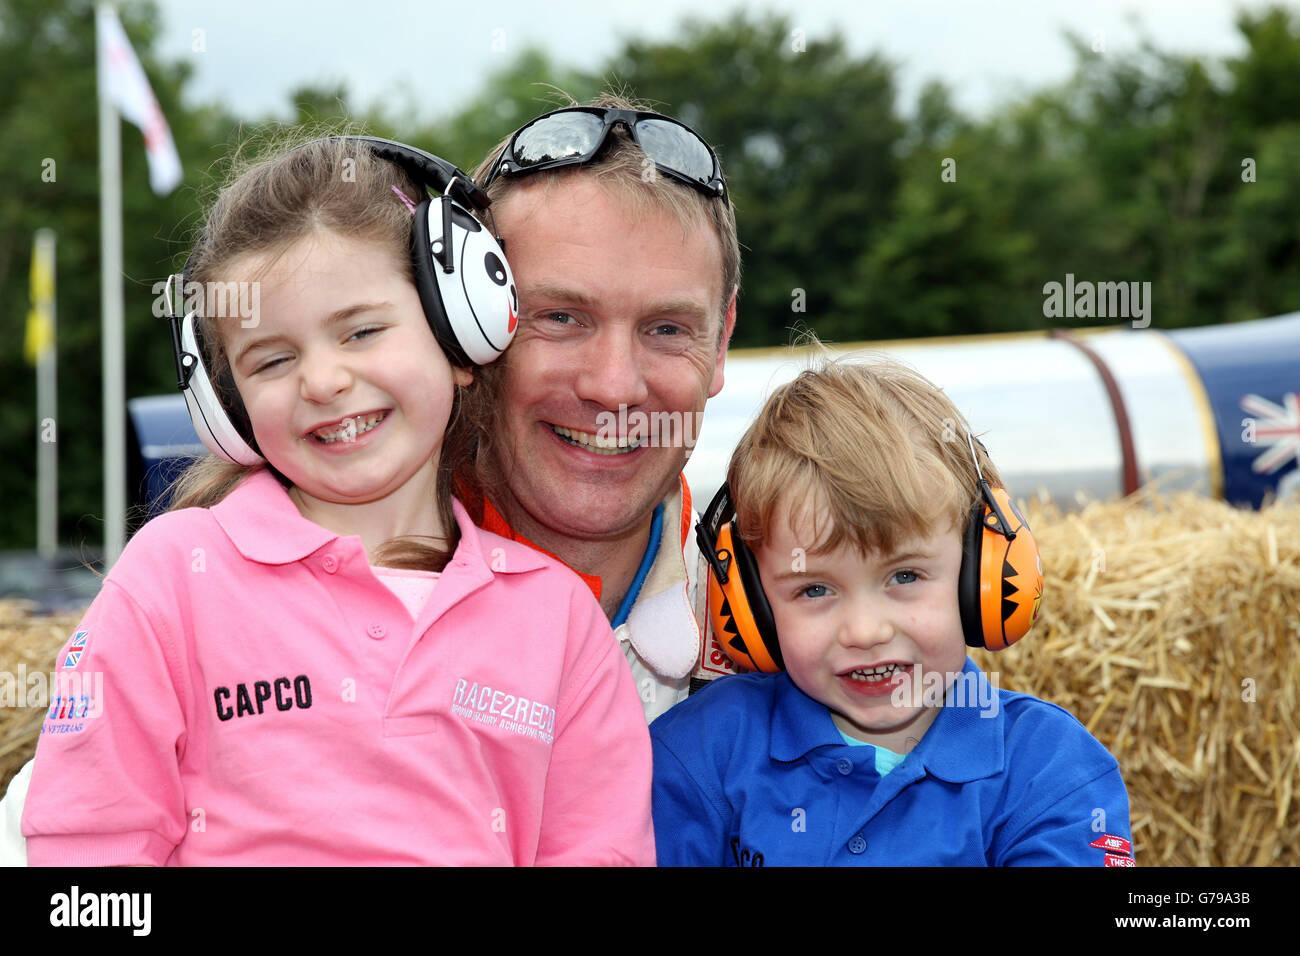 Malcolm Family Imágenes De Stock & Malcolm Family Fotos De Stock - Alamy